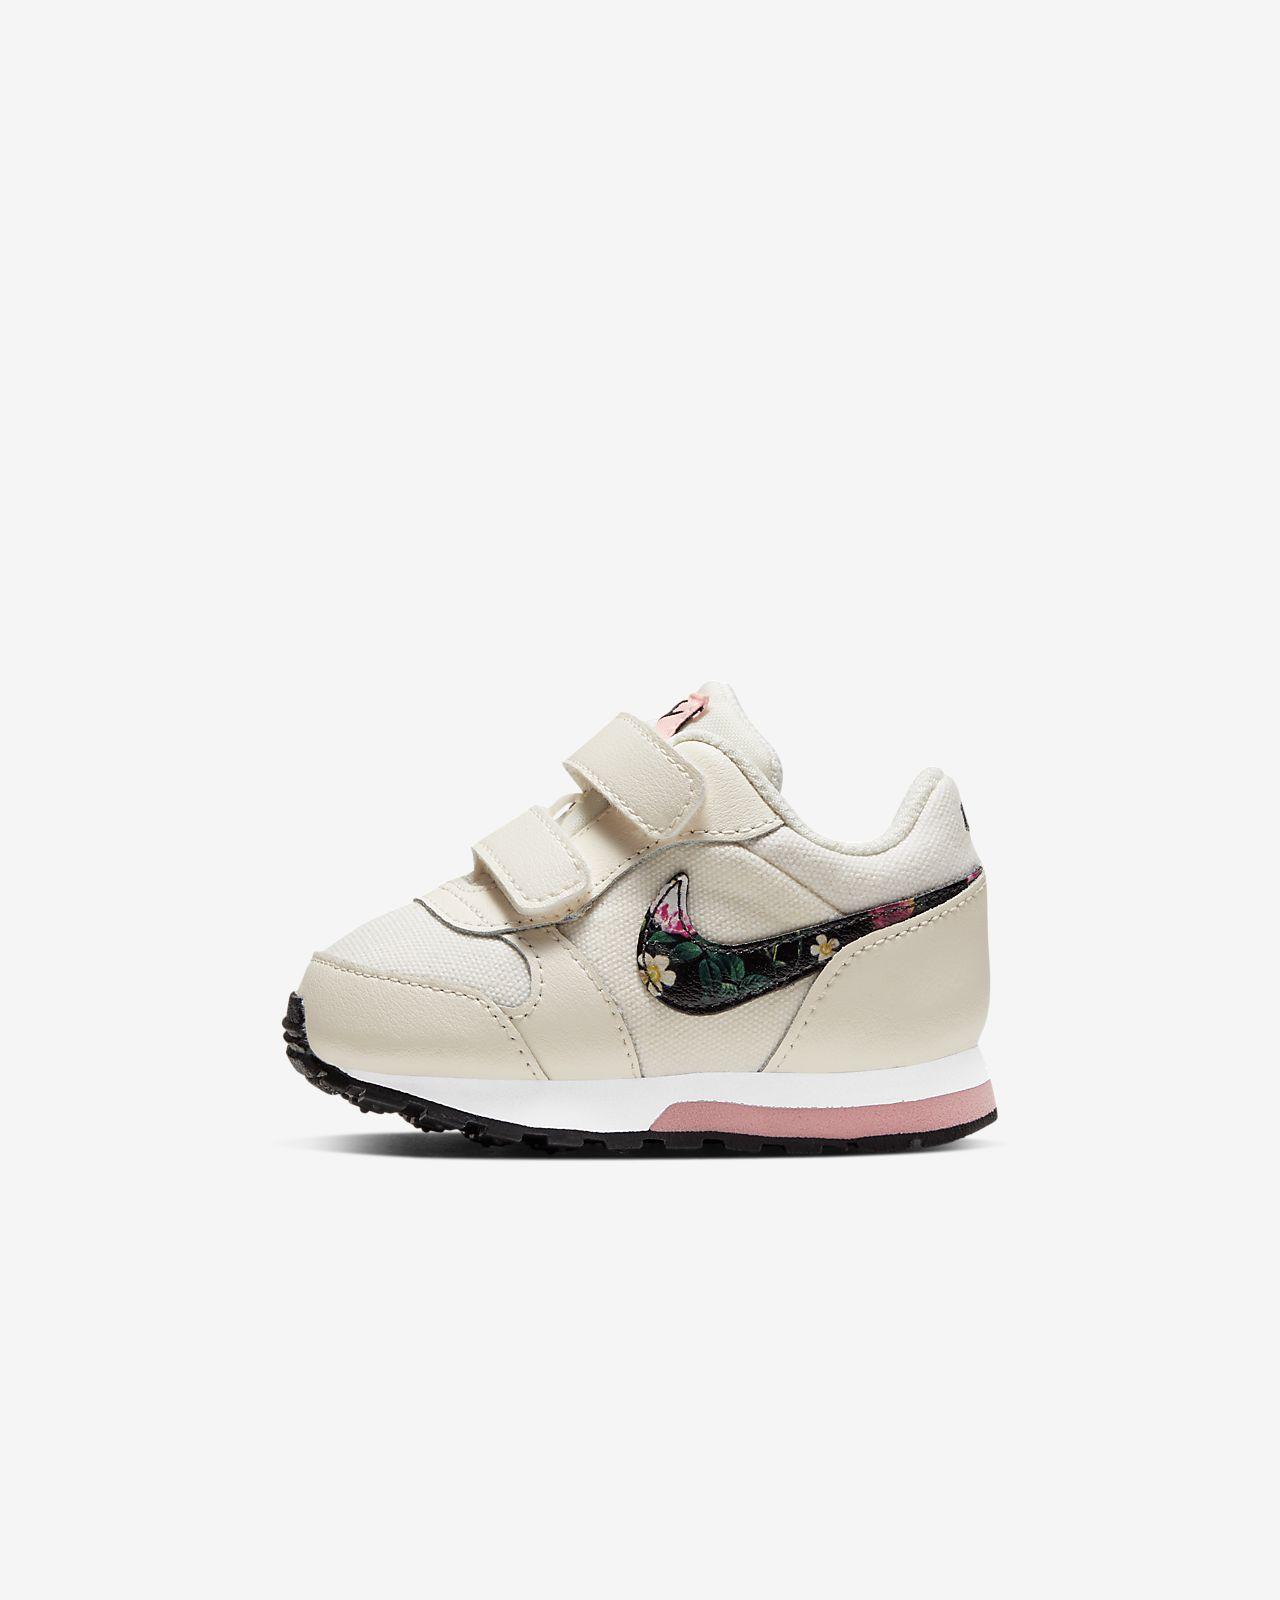 Calzado para bebés Nike MD Runner 2 Vintage Floral